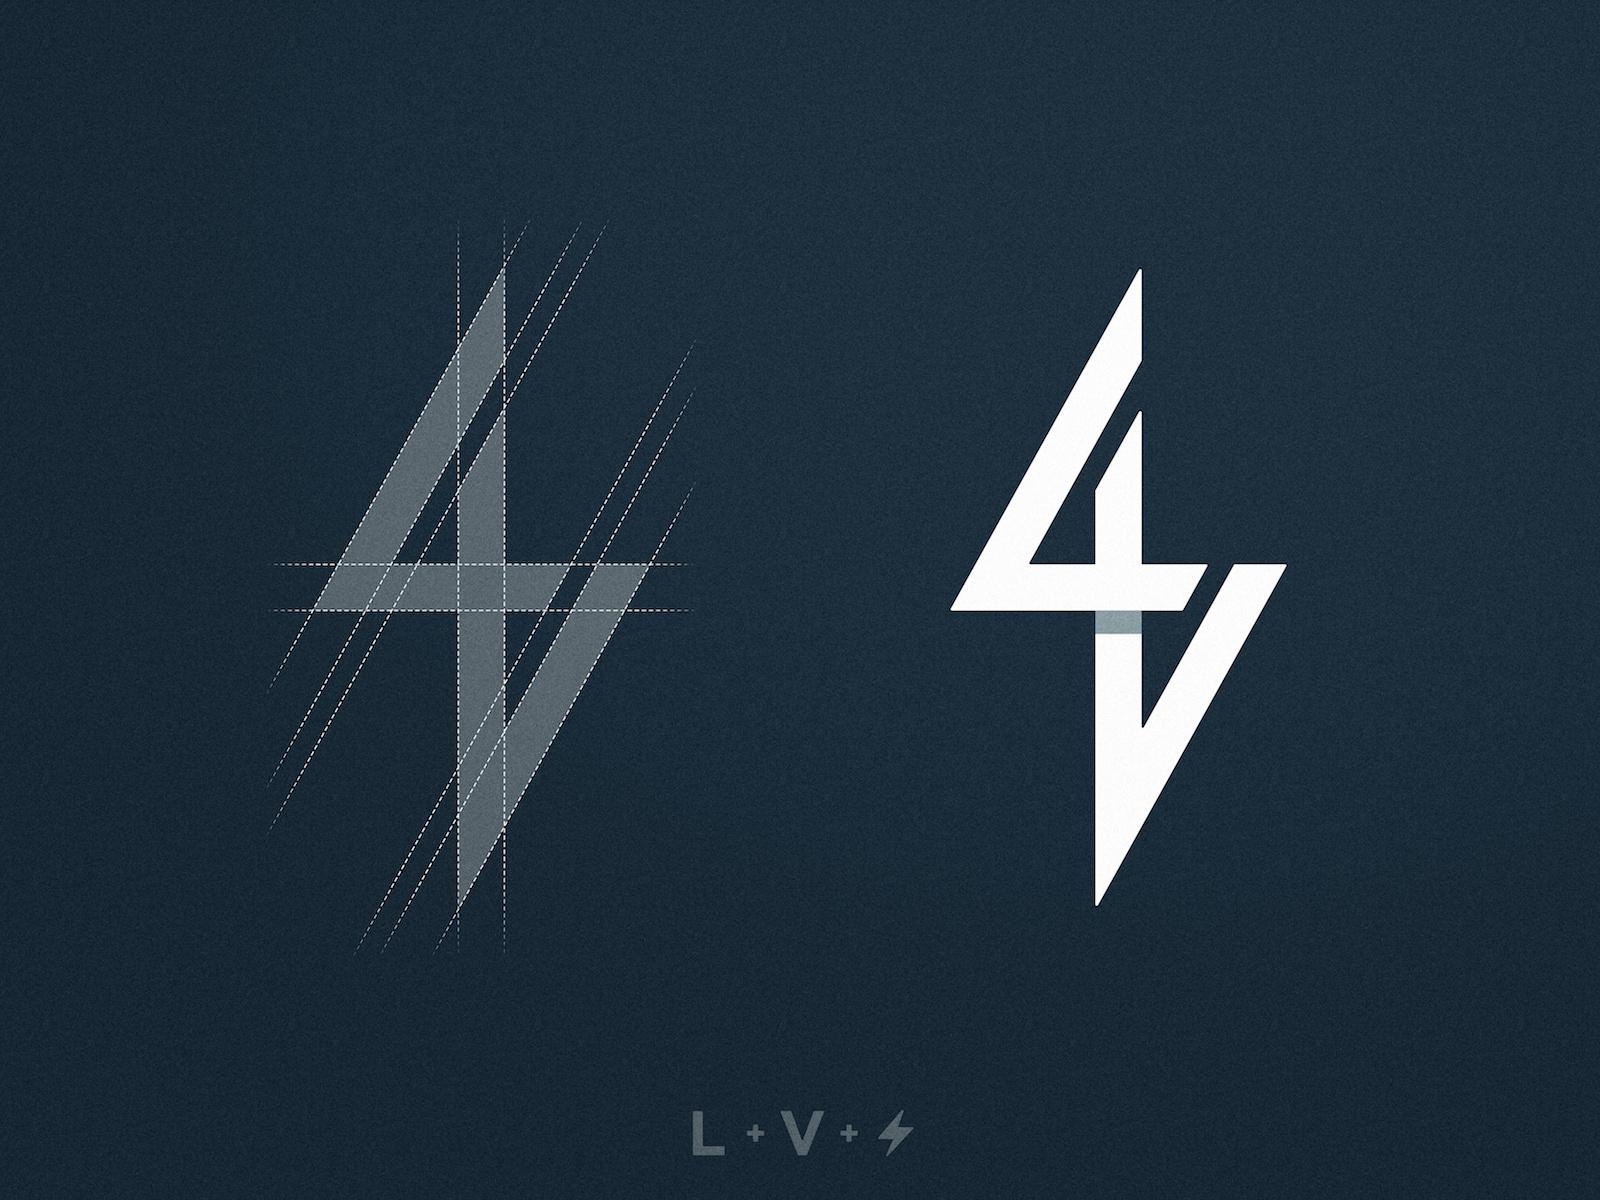 Logovolt lv drib 01 copy